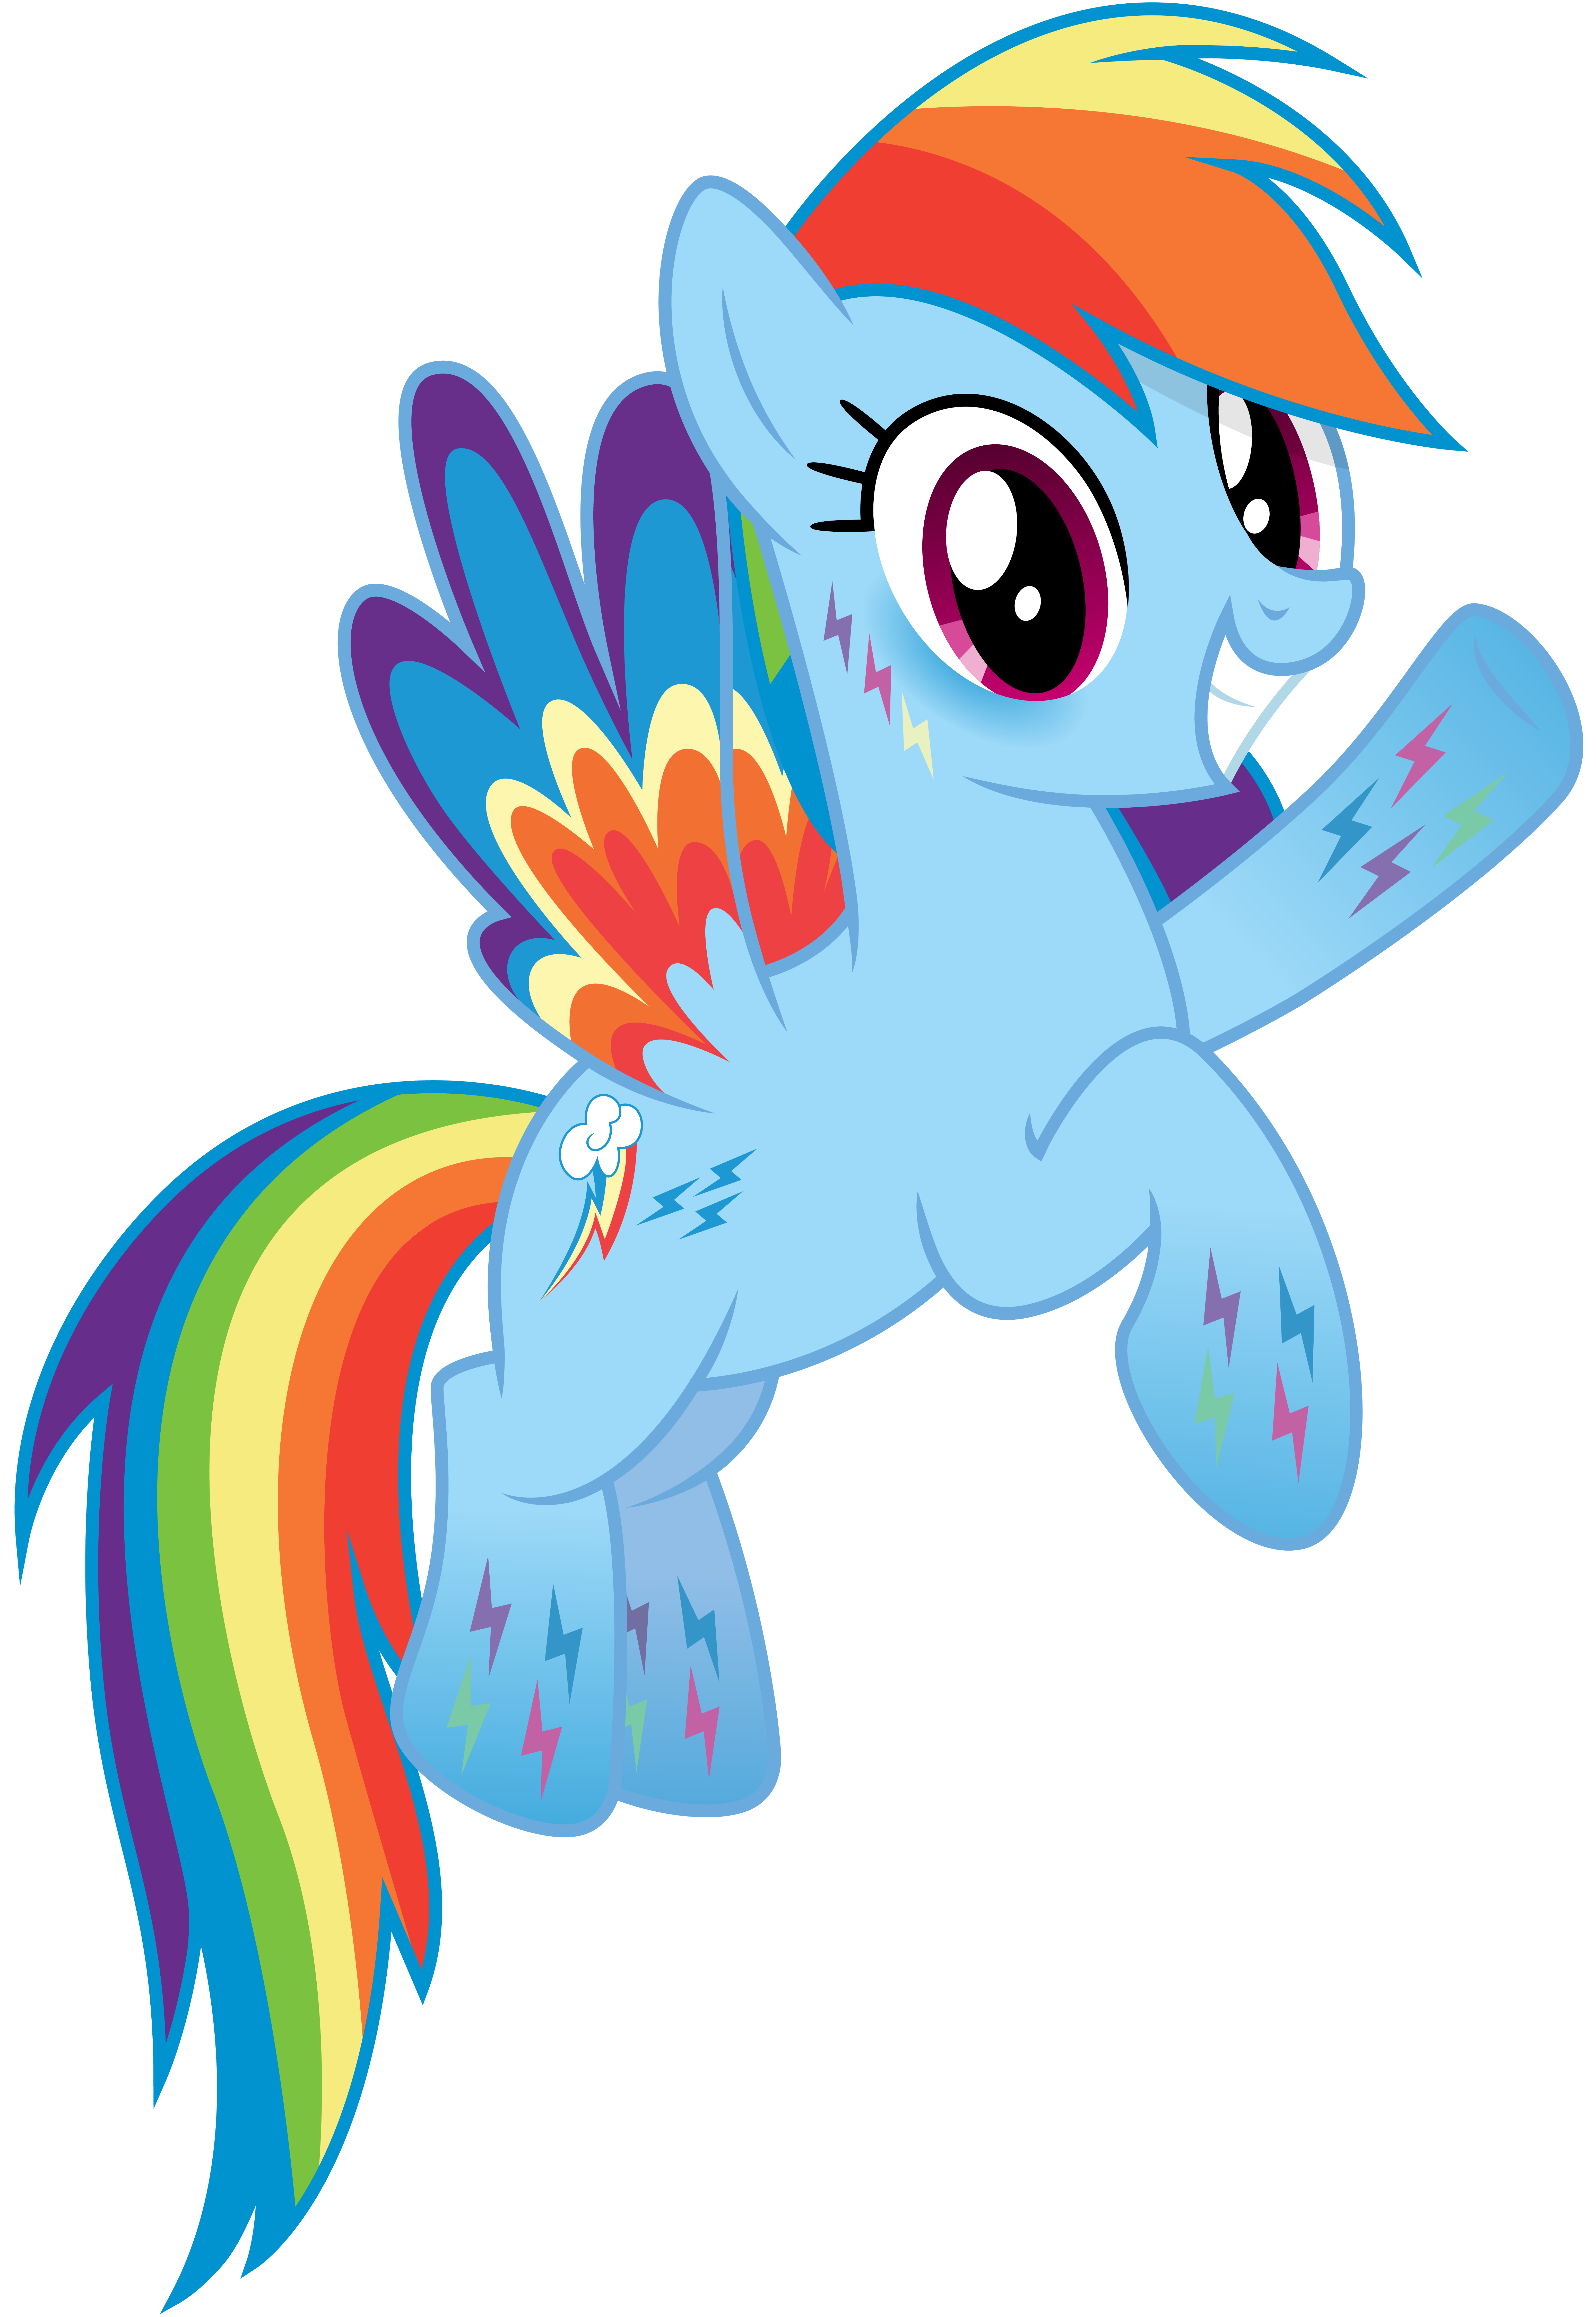 Rainbow Dash by Myardius on DeviantArt